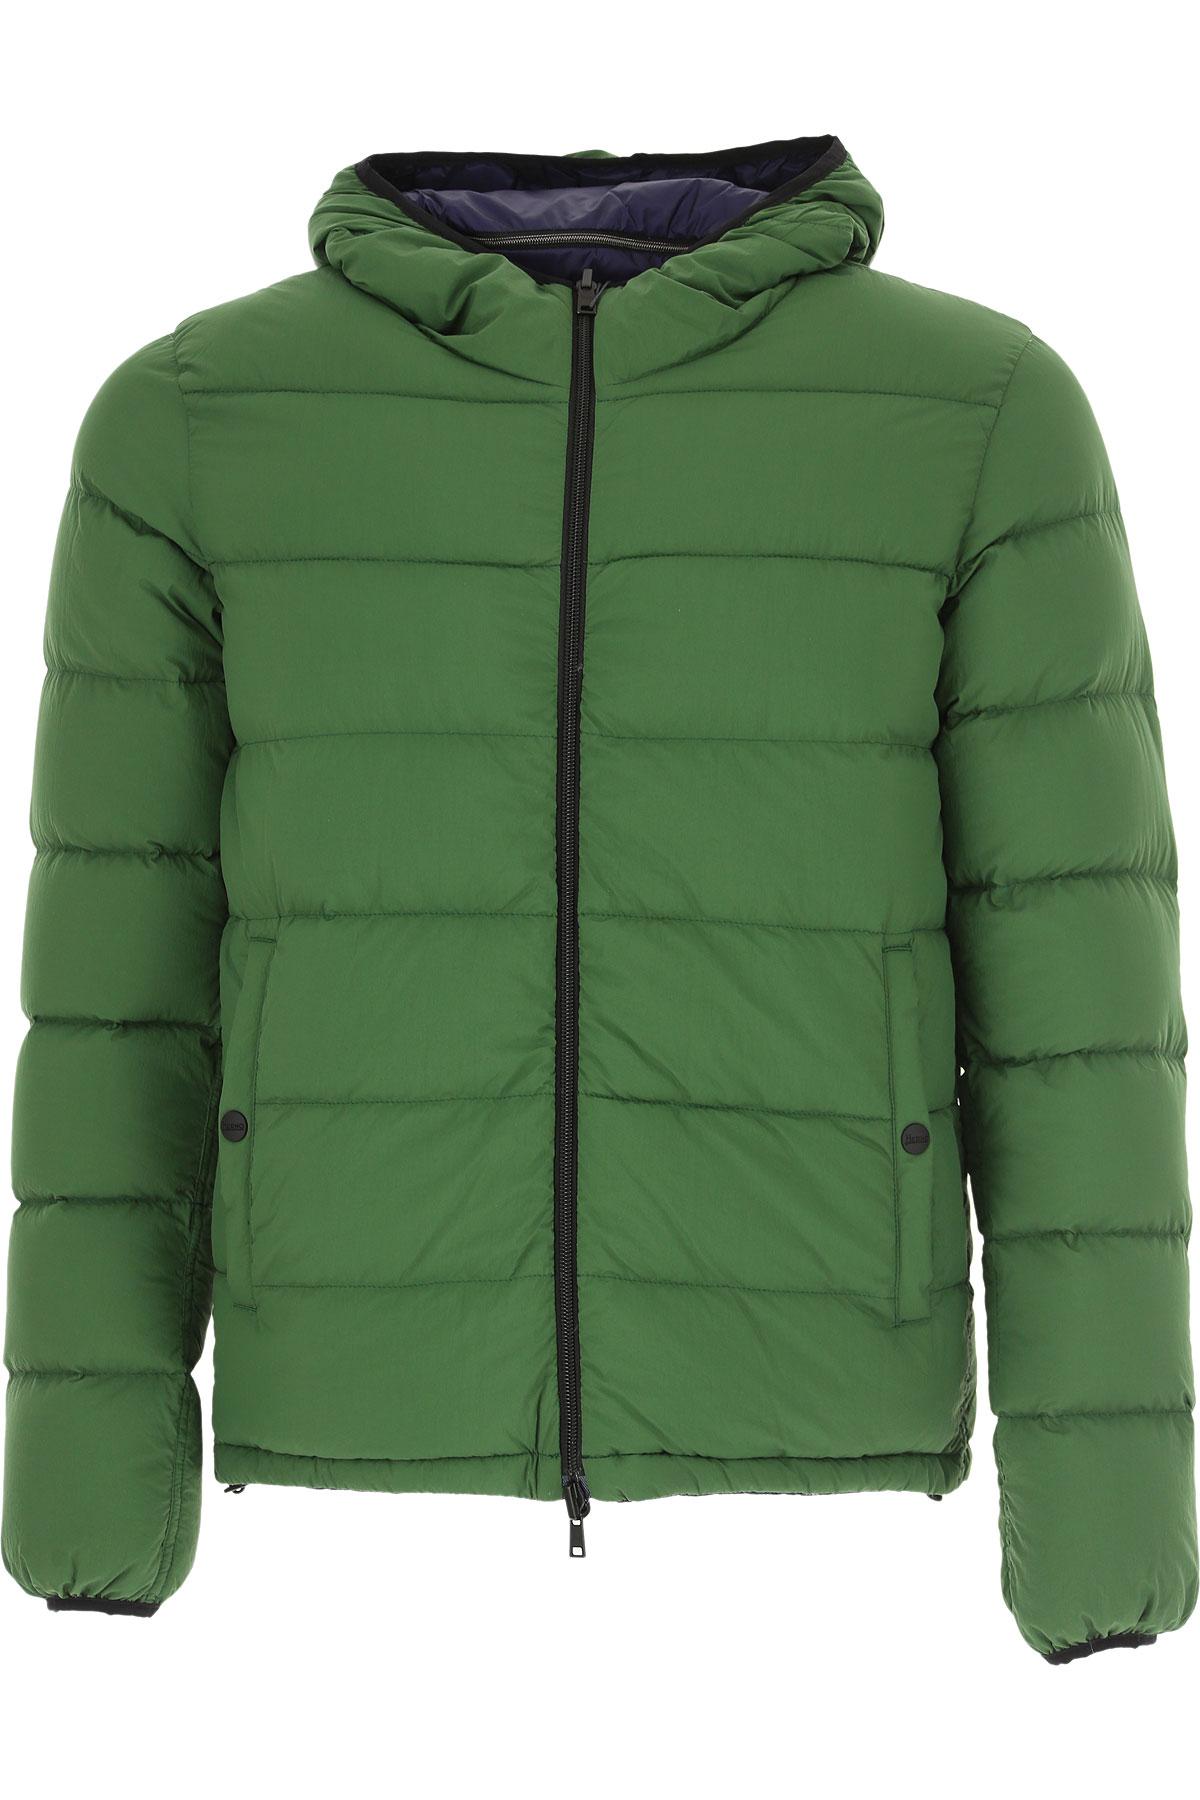 Herno Down Jacket for Men, Puffer Ski Jacket On Sale, Green, polyamide, 2019, L M S XL XXXL